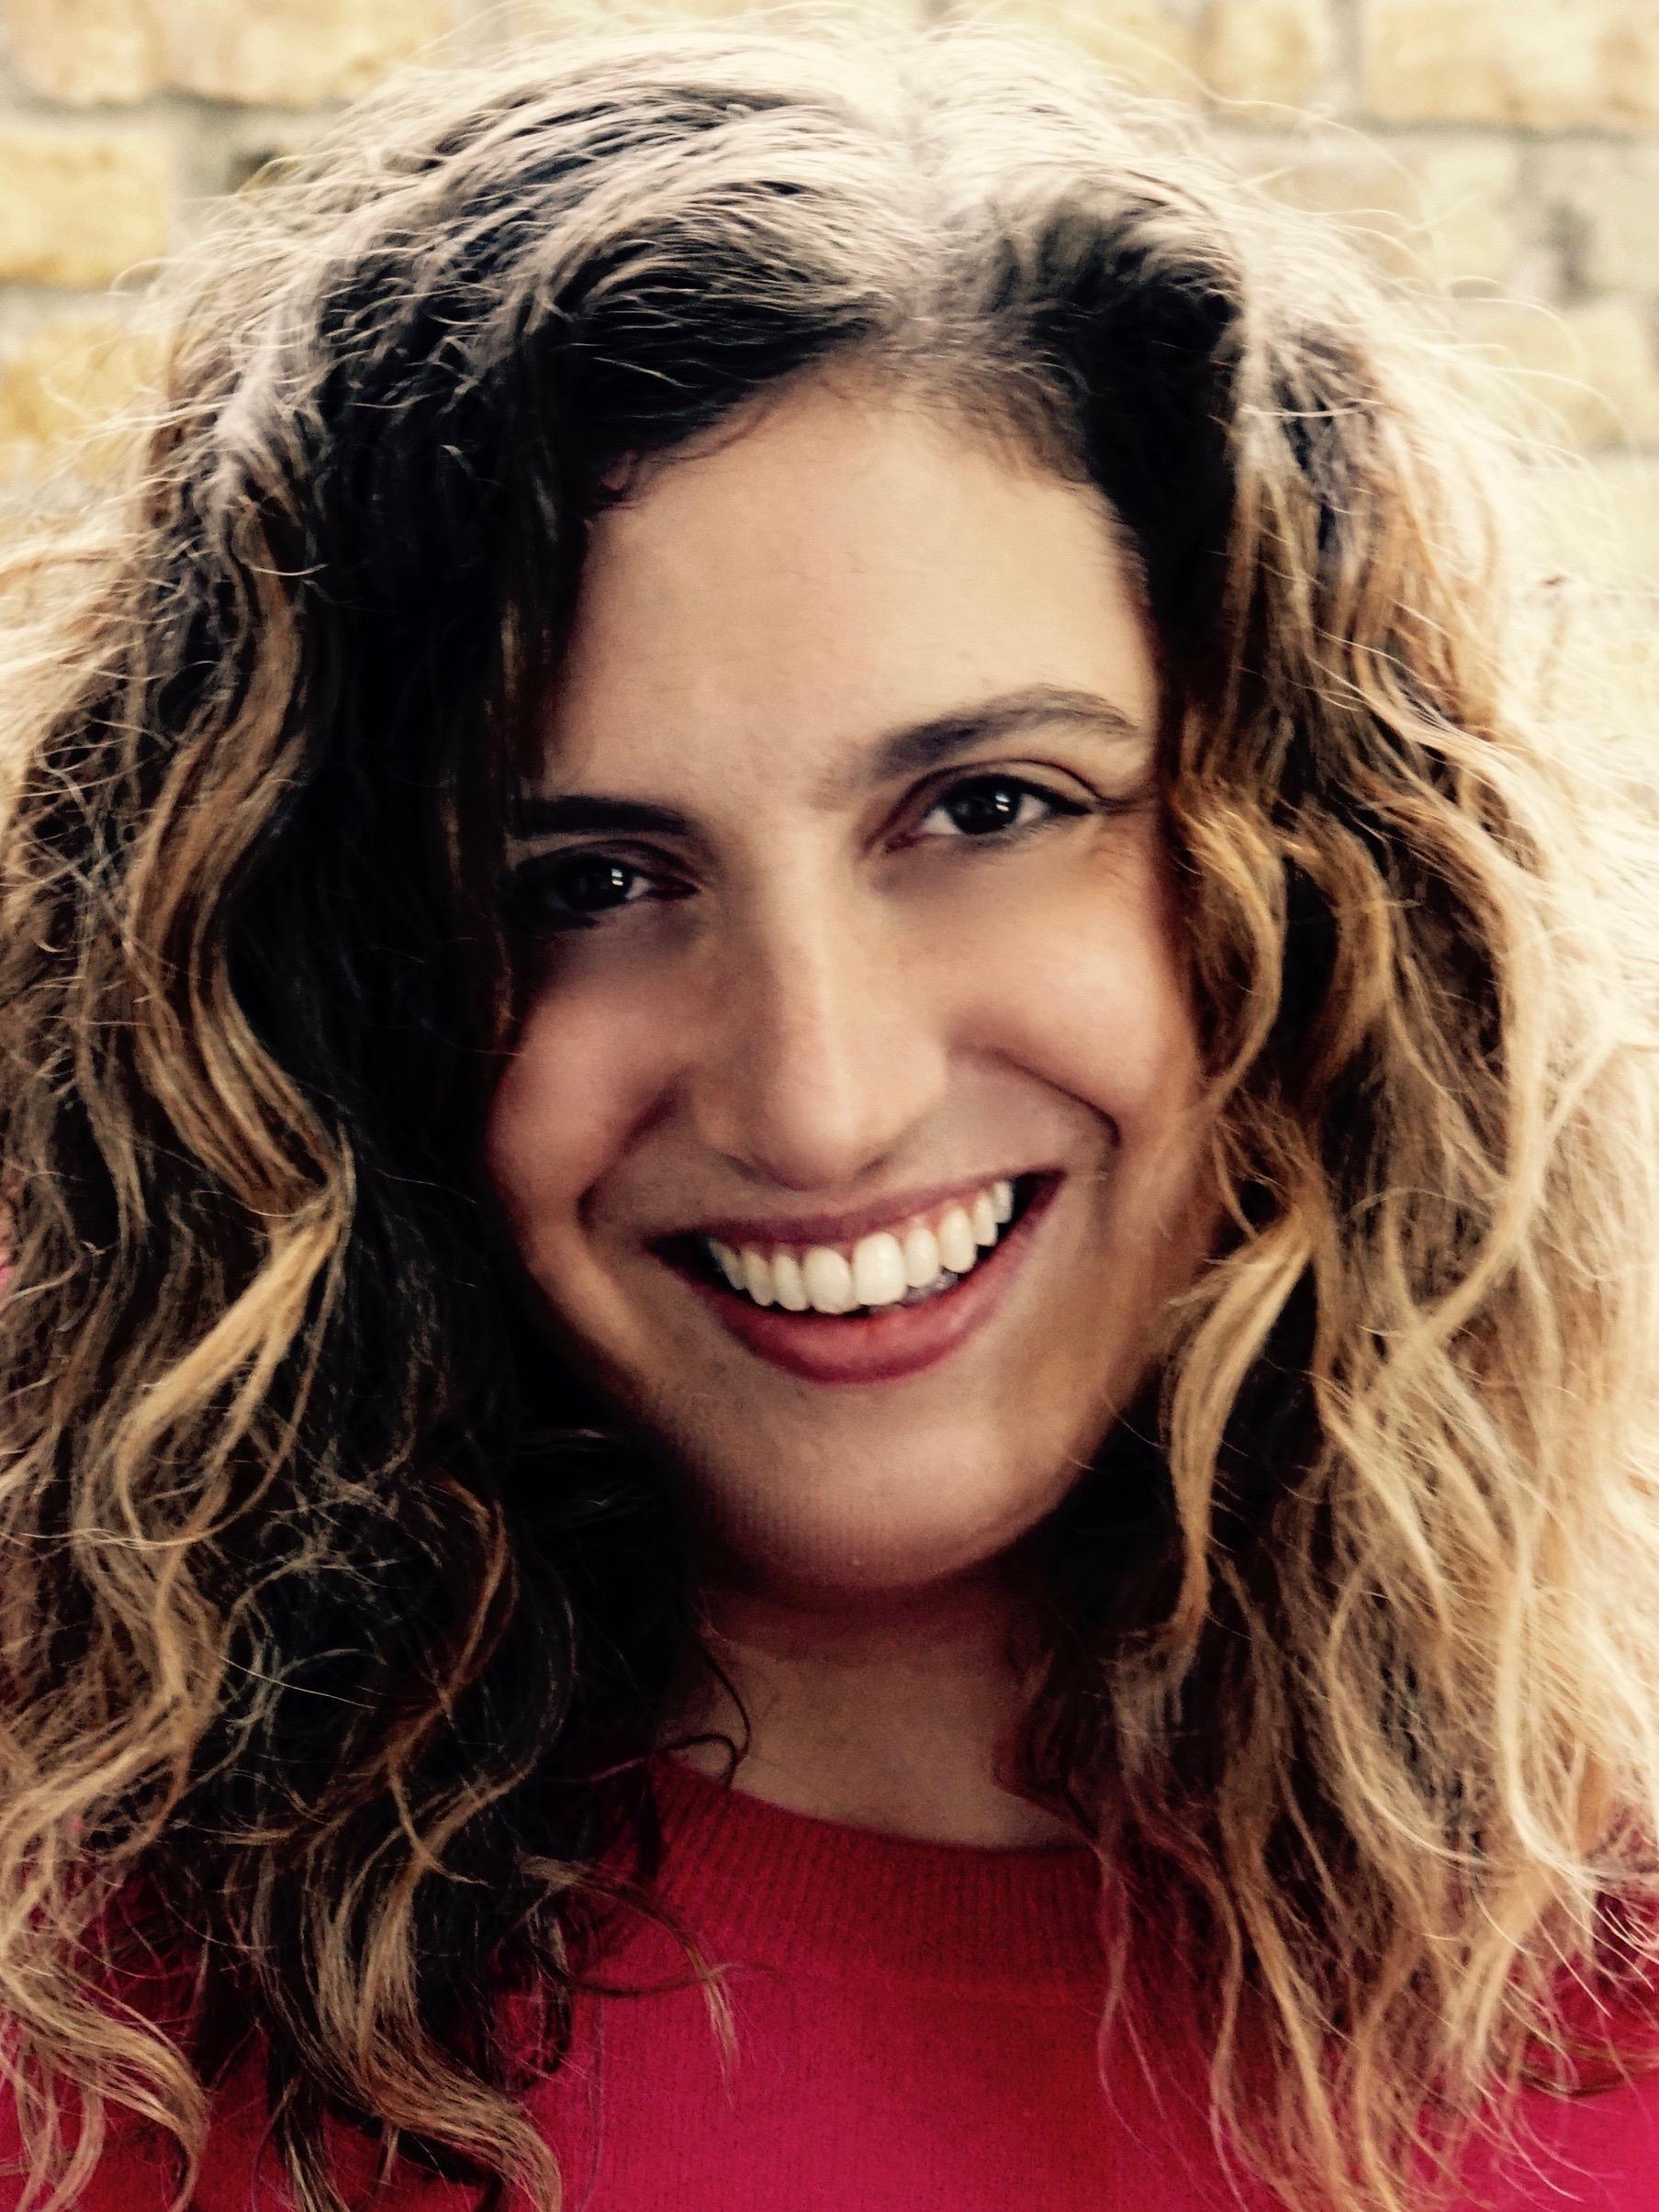 Aviva Leeman